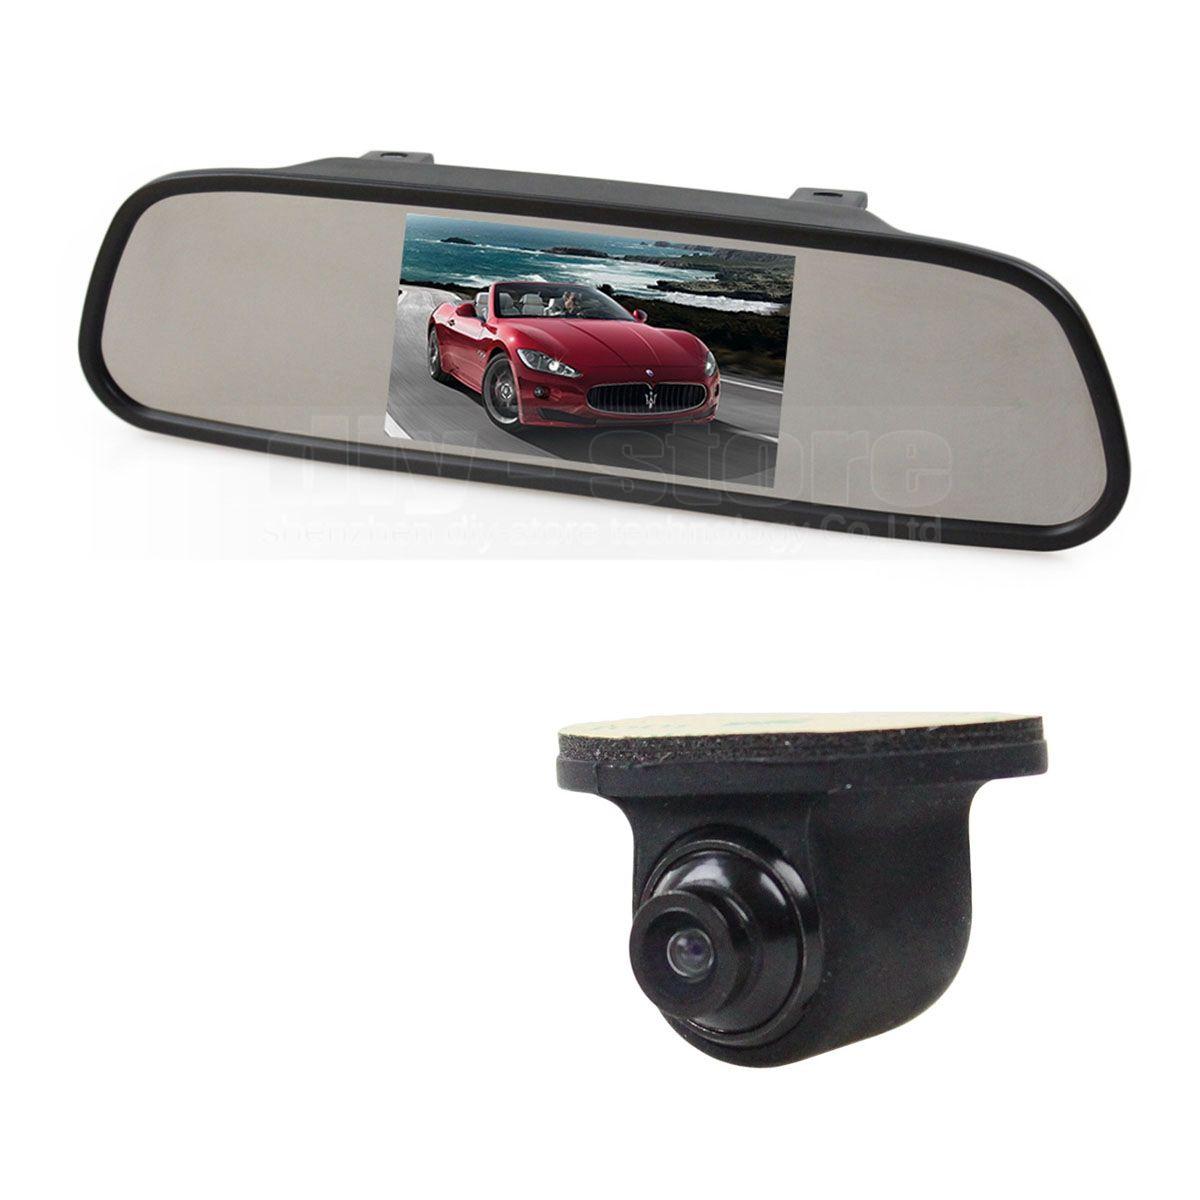 5inch TFT LCD Display Car Monitor Rear View Mirror Monitor + CCD Backup Rear / Front / Side View Camera Cam